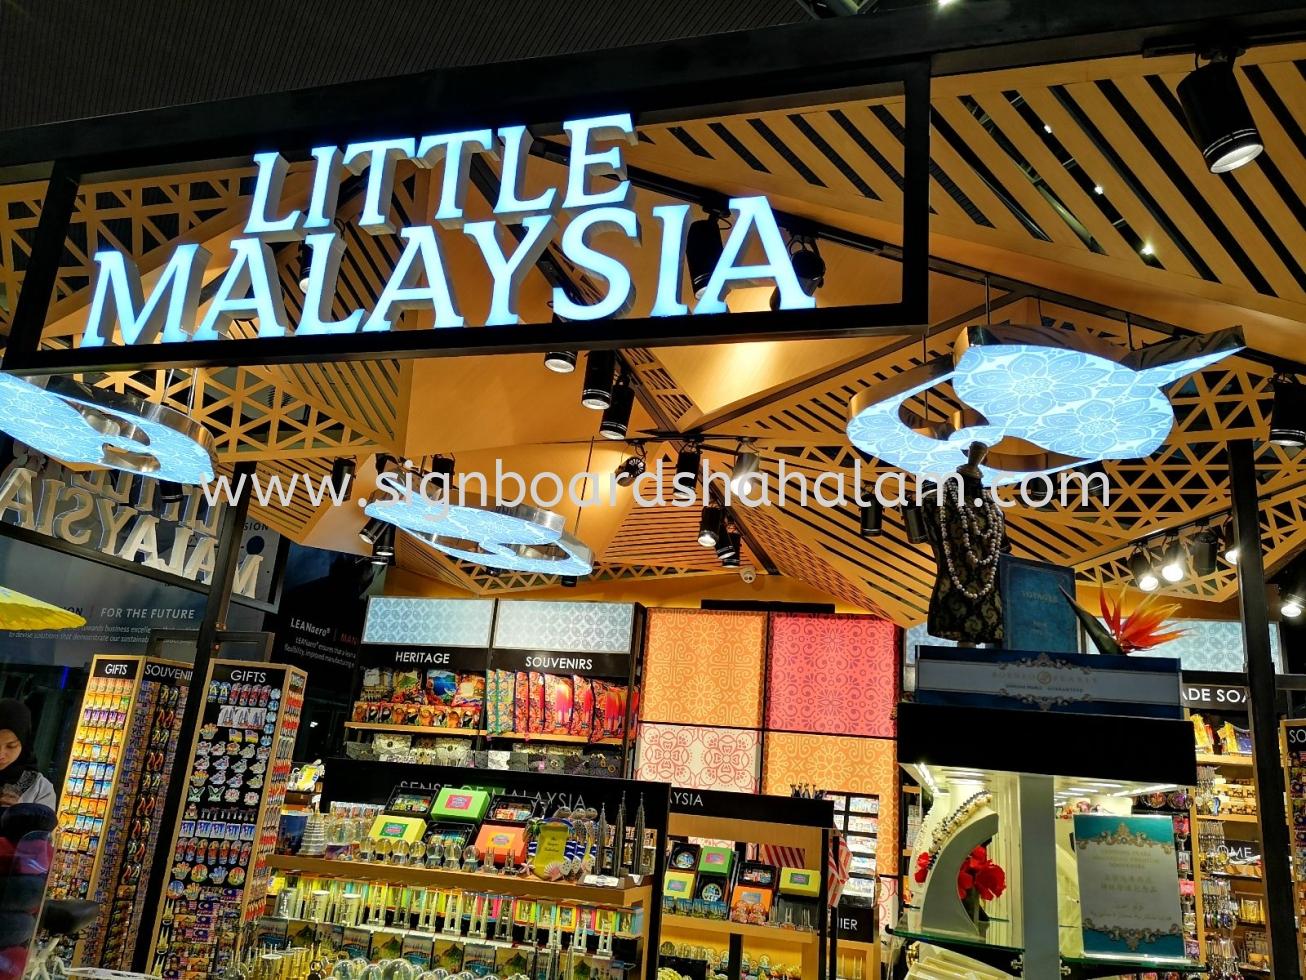 Little Malaysia Signage, KLIA